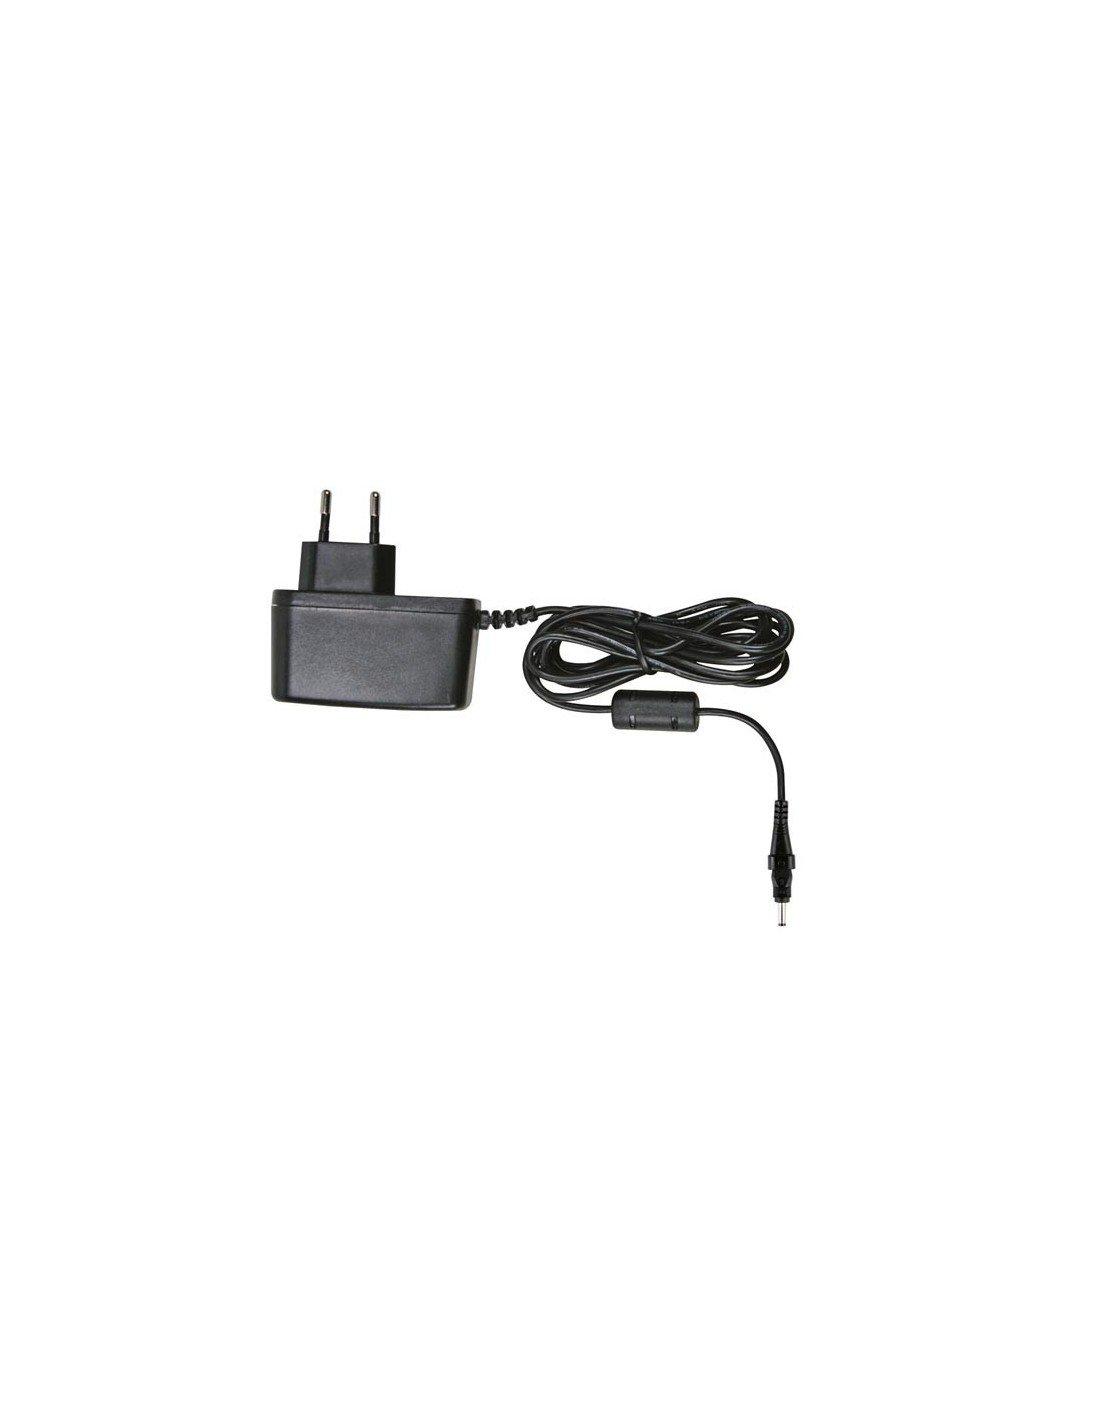 Power Supplies 400234 Stecker-Schaltnetzteil, 15 VDC, 1.2 Amp VS Electronic Vertriebs GmbH